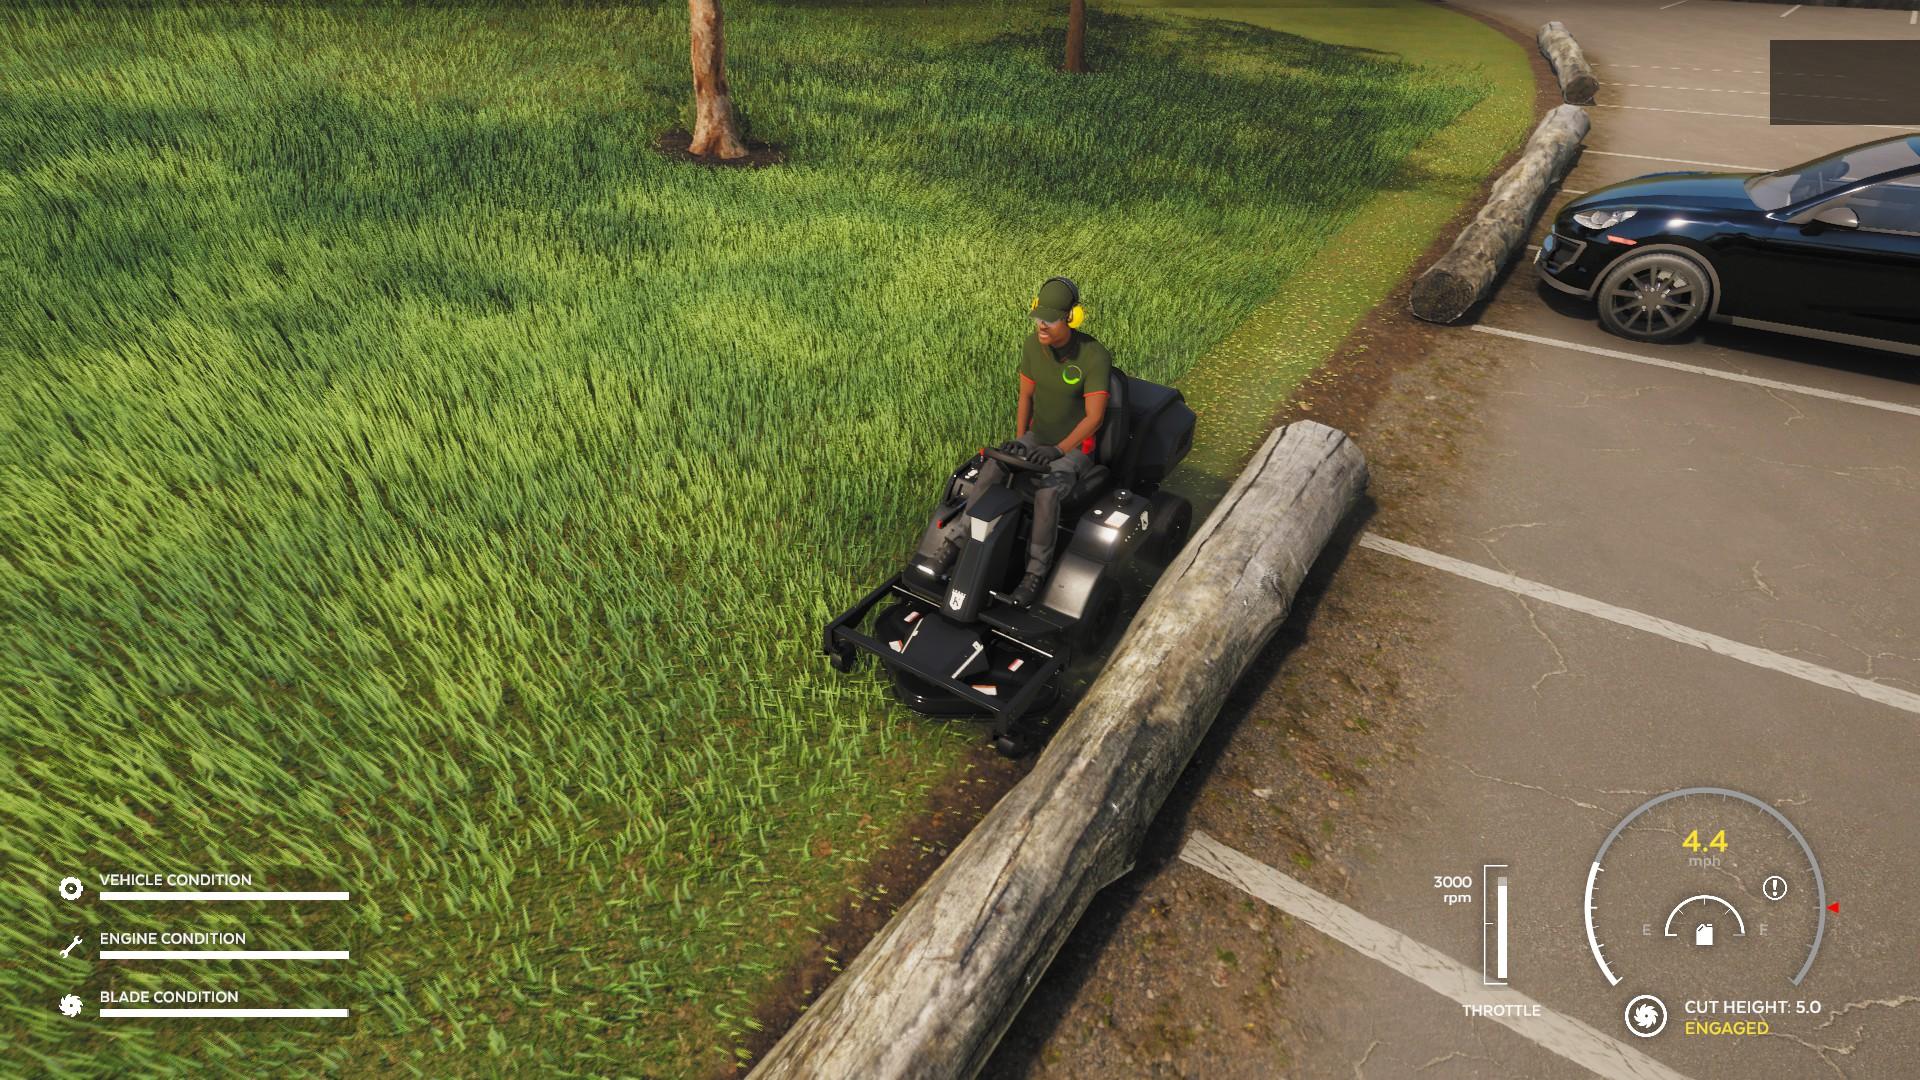 Lawn Mowing Simulator Steam Demo